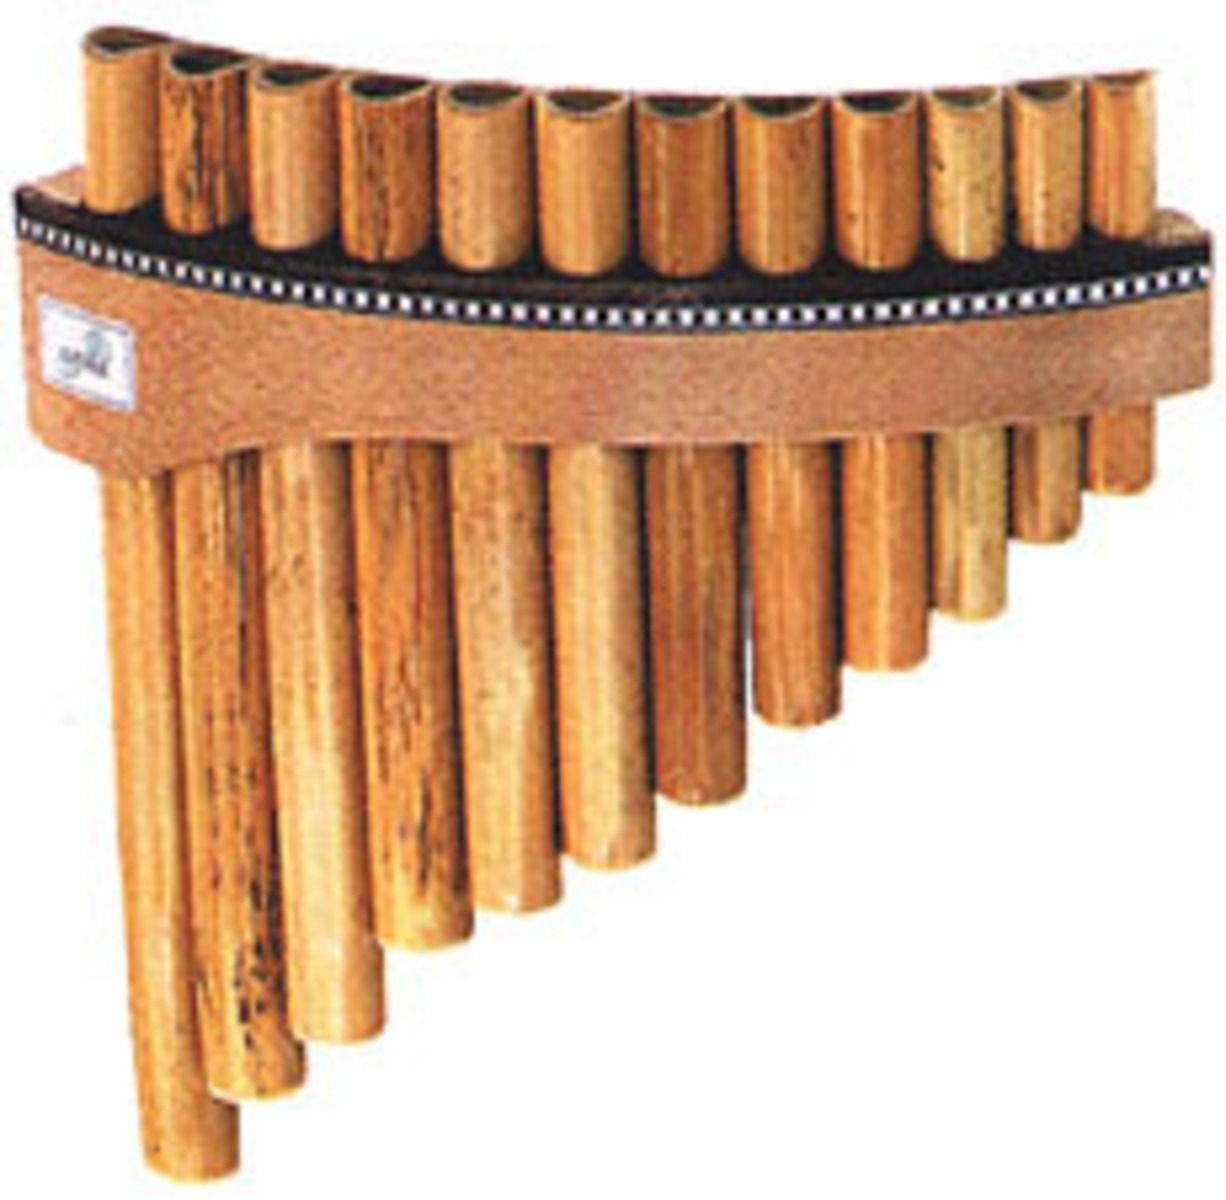 Gewa flûte de pan image (#22886) - Audiofanzine